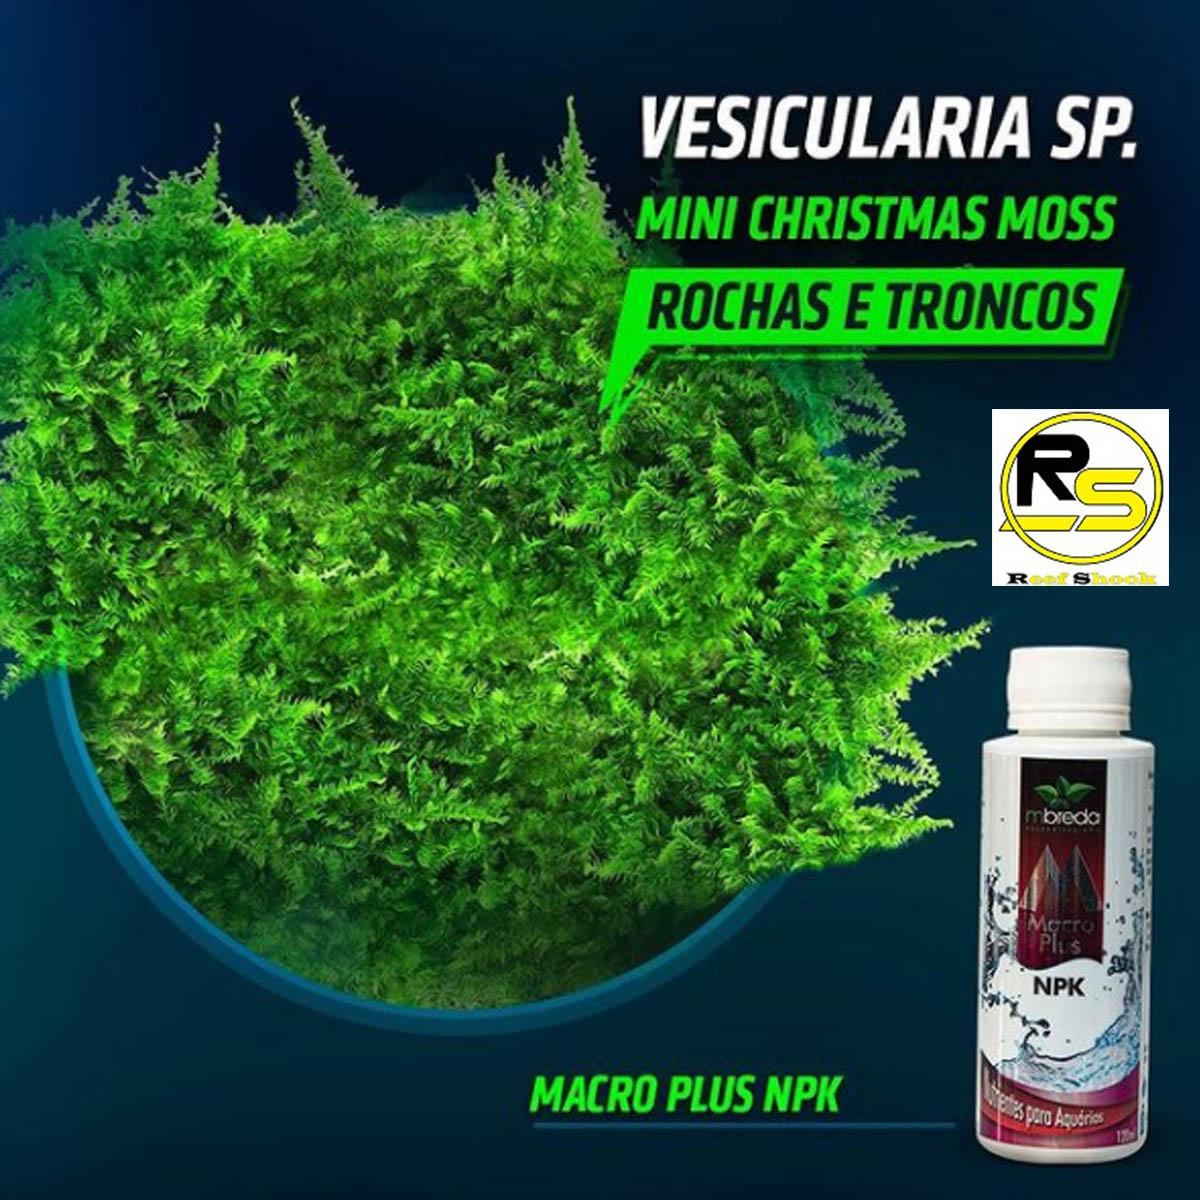 Mbreda Macroplus NPK 120ml Fertilizante para Aquario Plantado